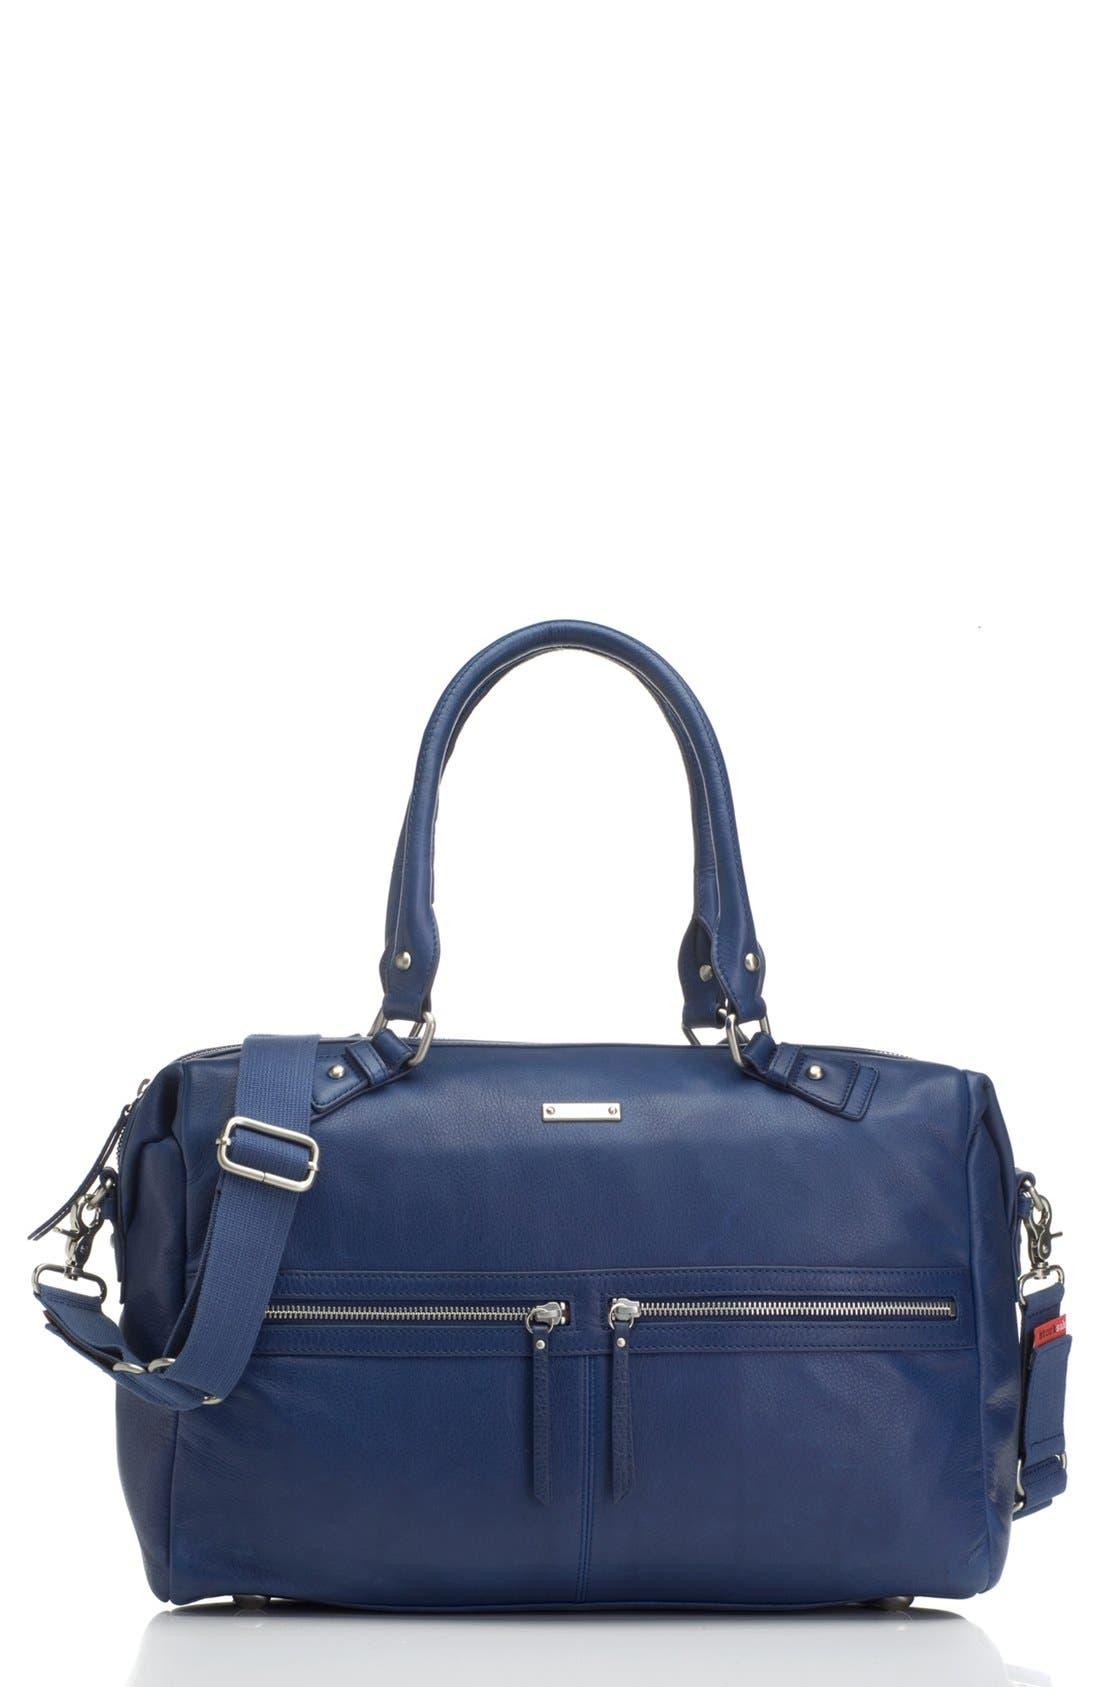 Alternate Image 1 Selected - Storksak 'Caroline' Leather Diaper Bag